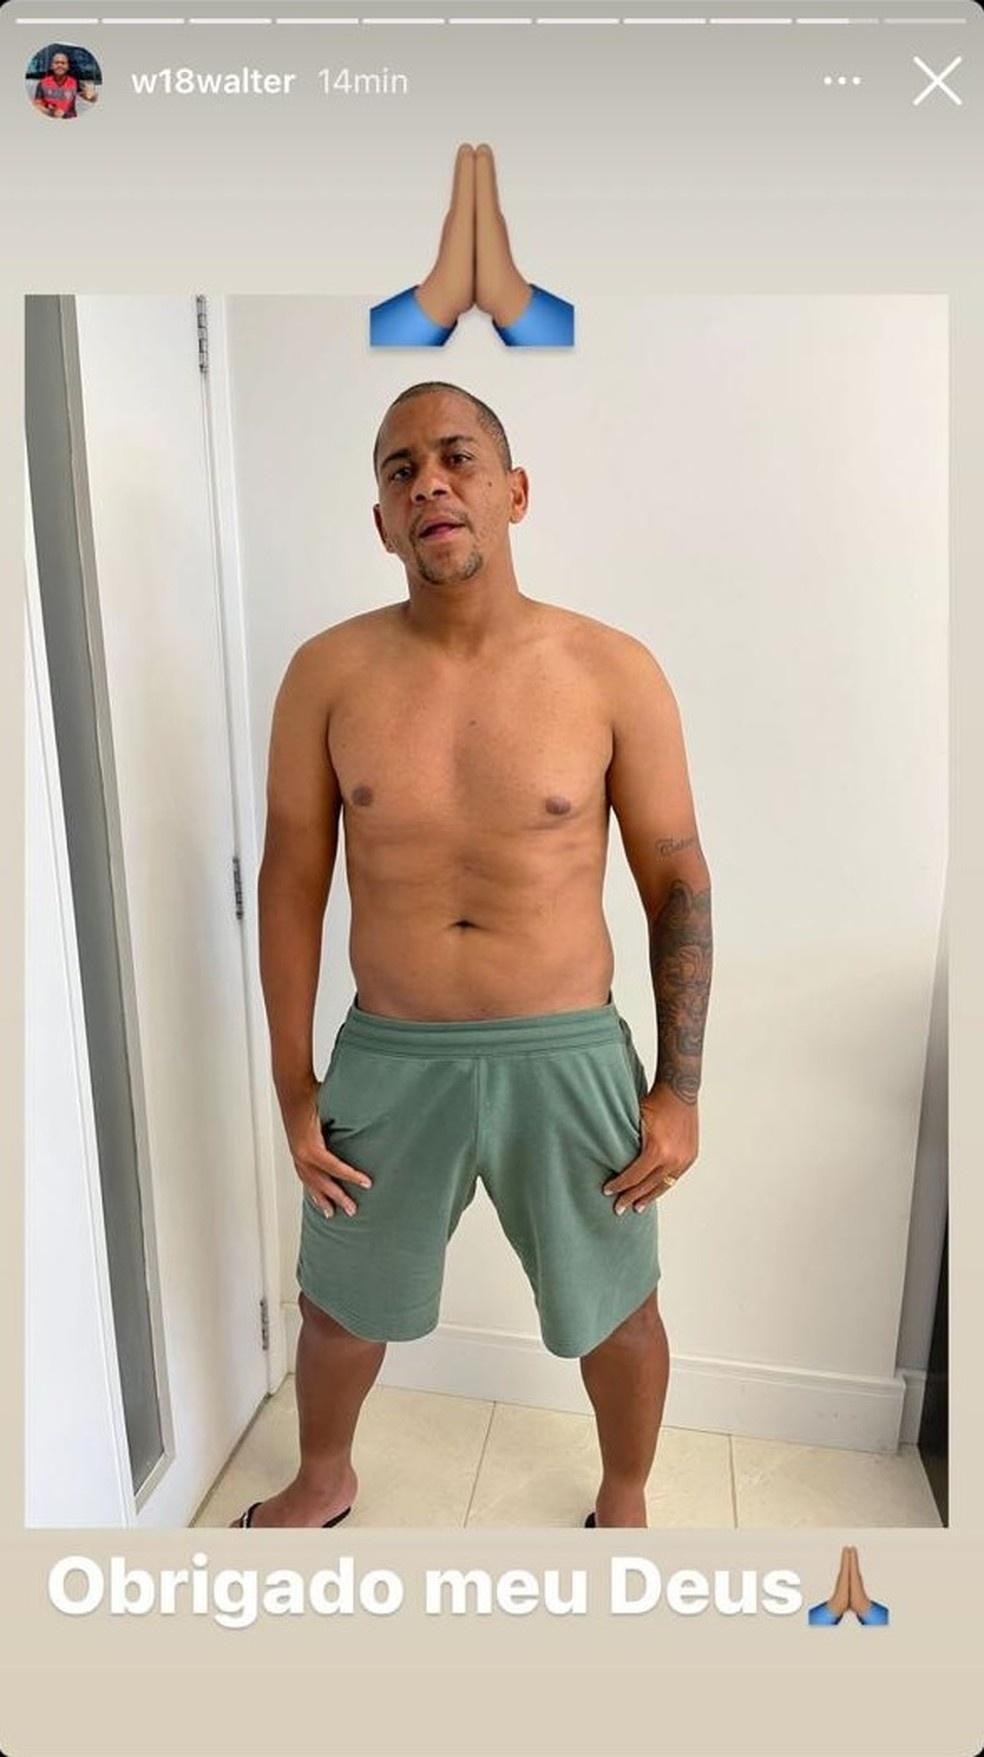 Walter publicou foto sem camisa no Instagram